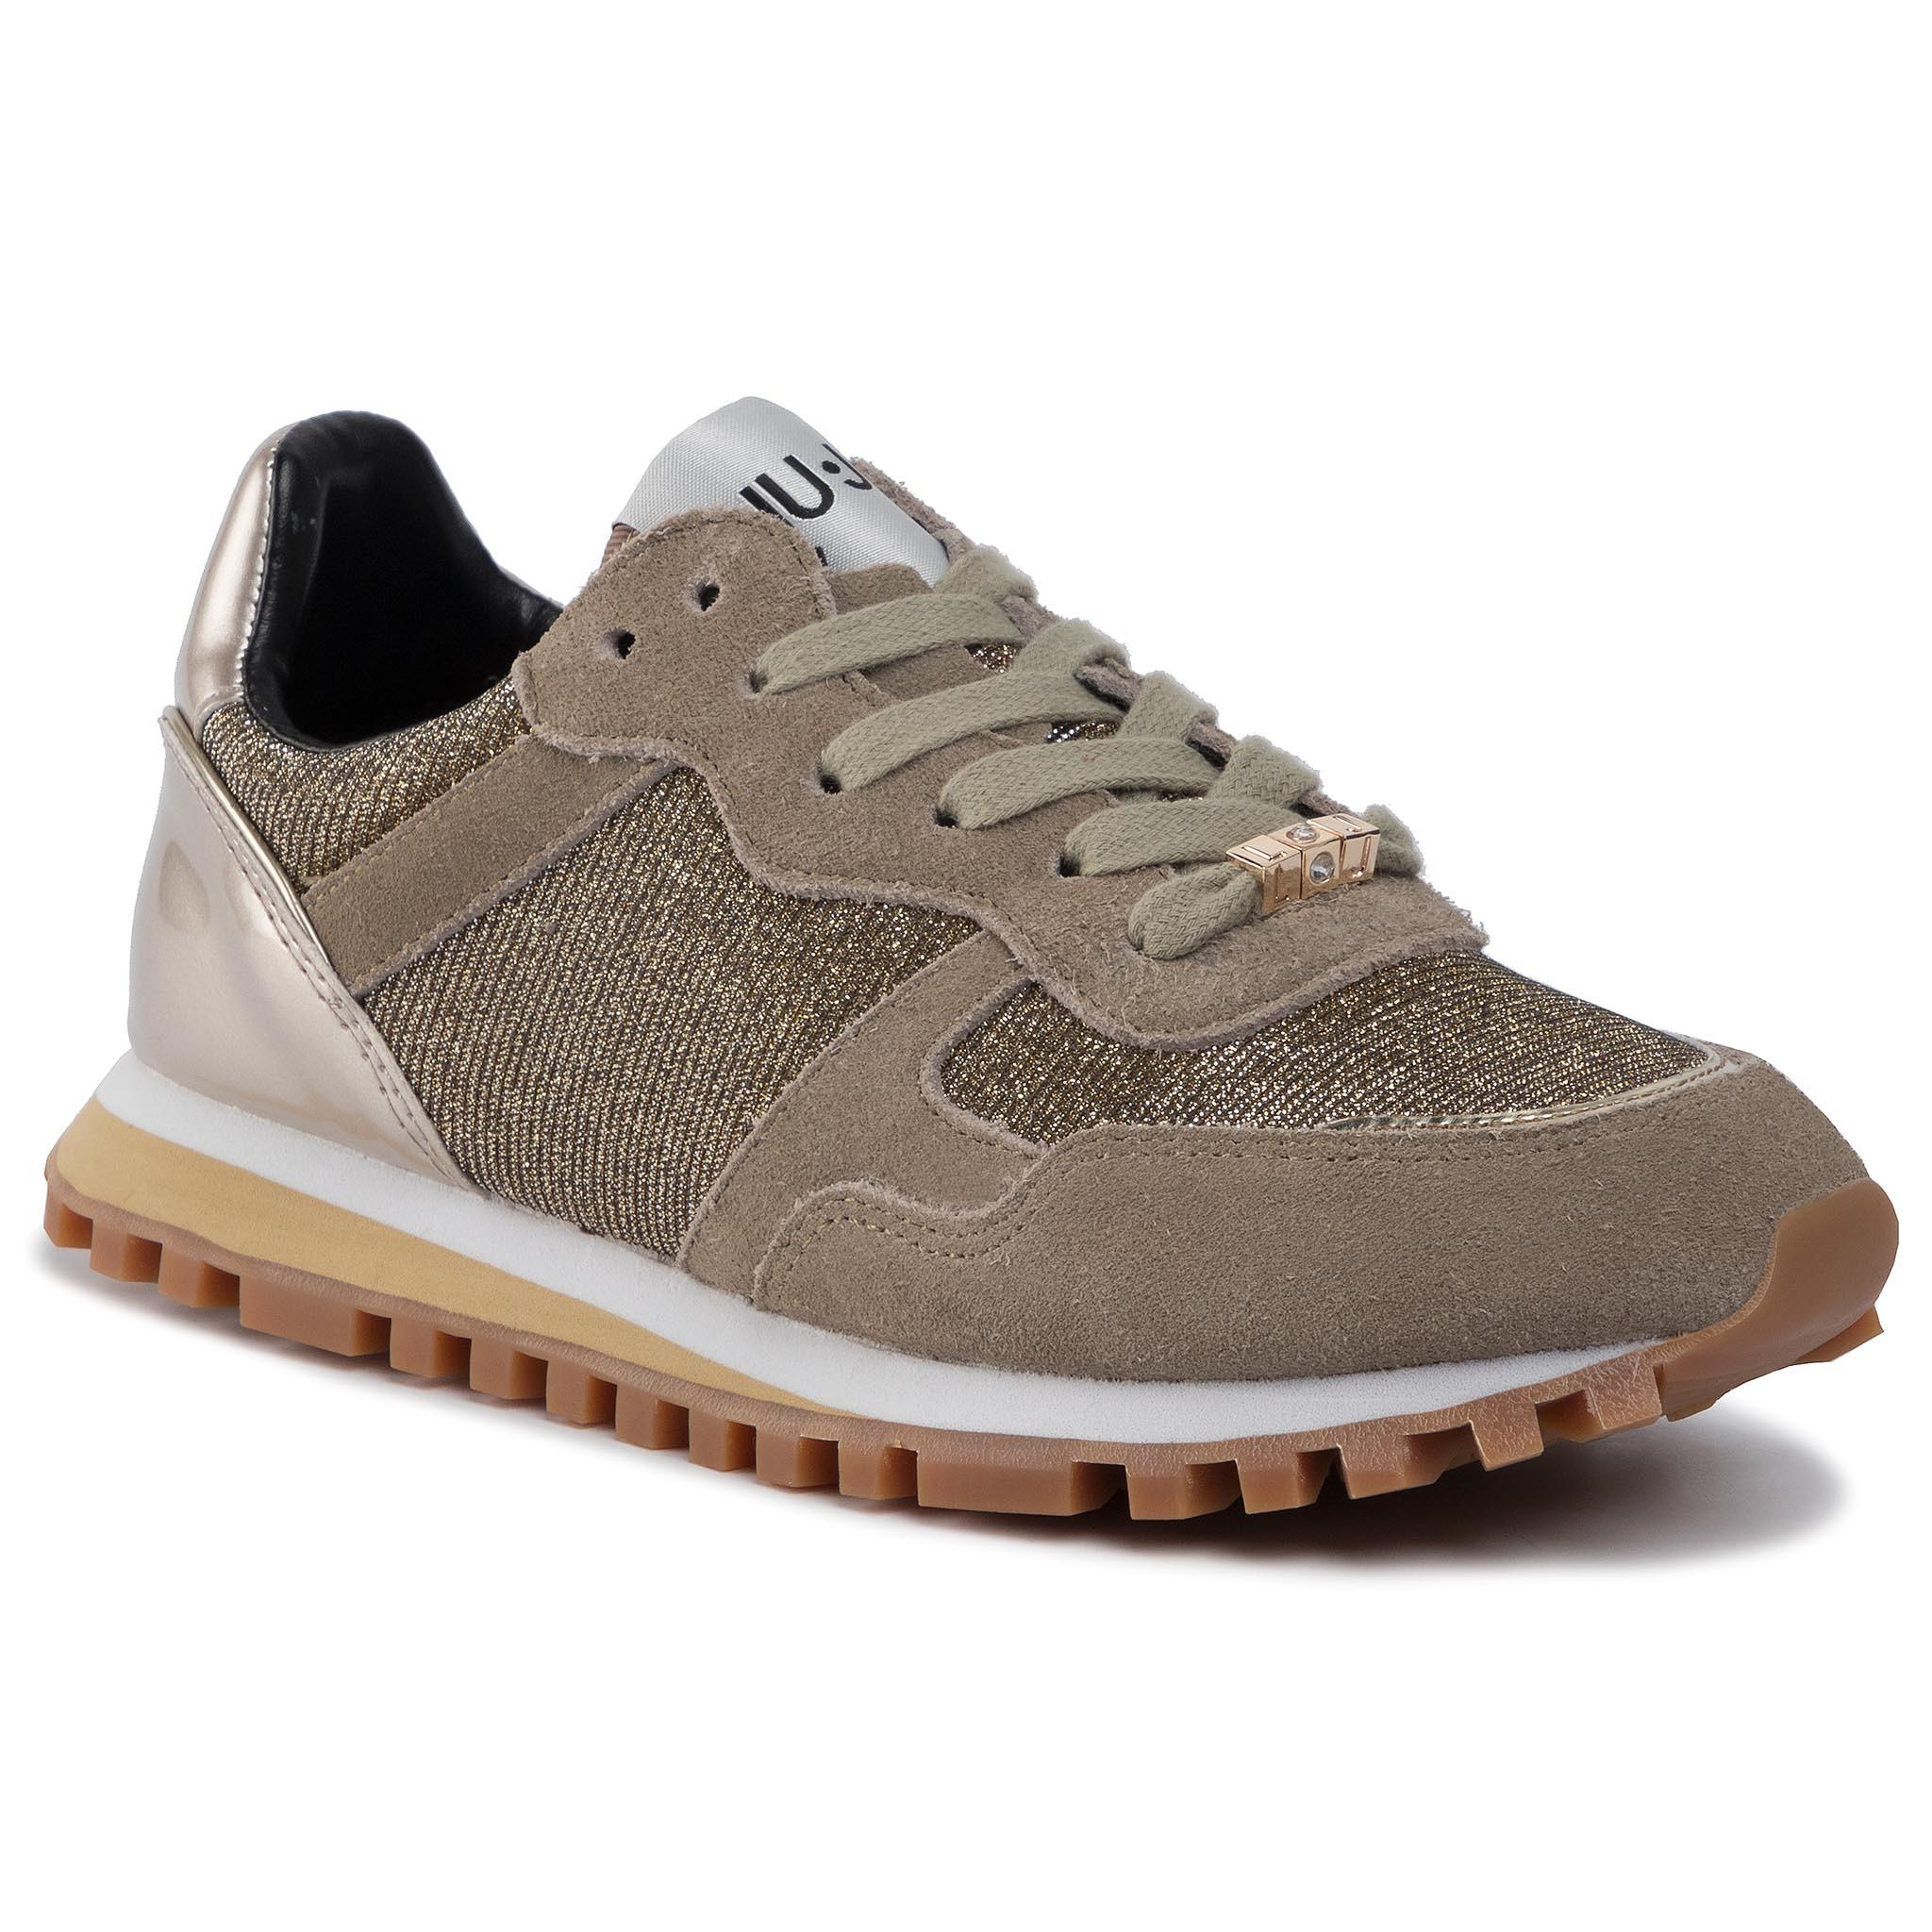 Sneakers LIU JO - Wonder BXX049 PX067 Suede 81140